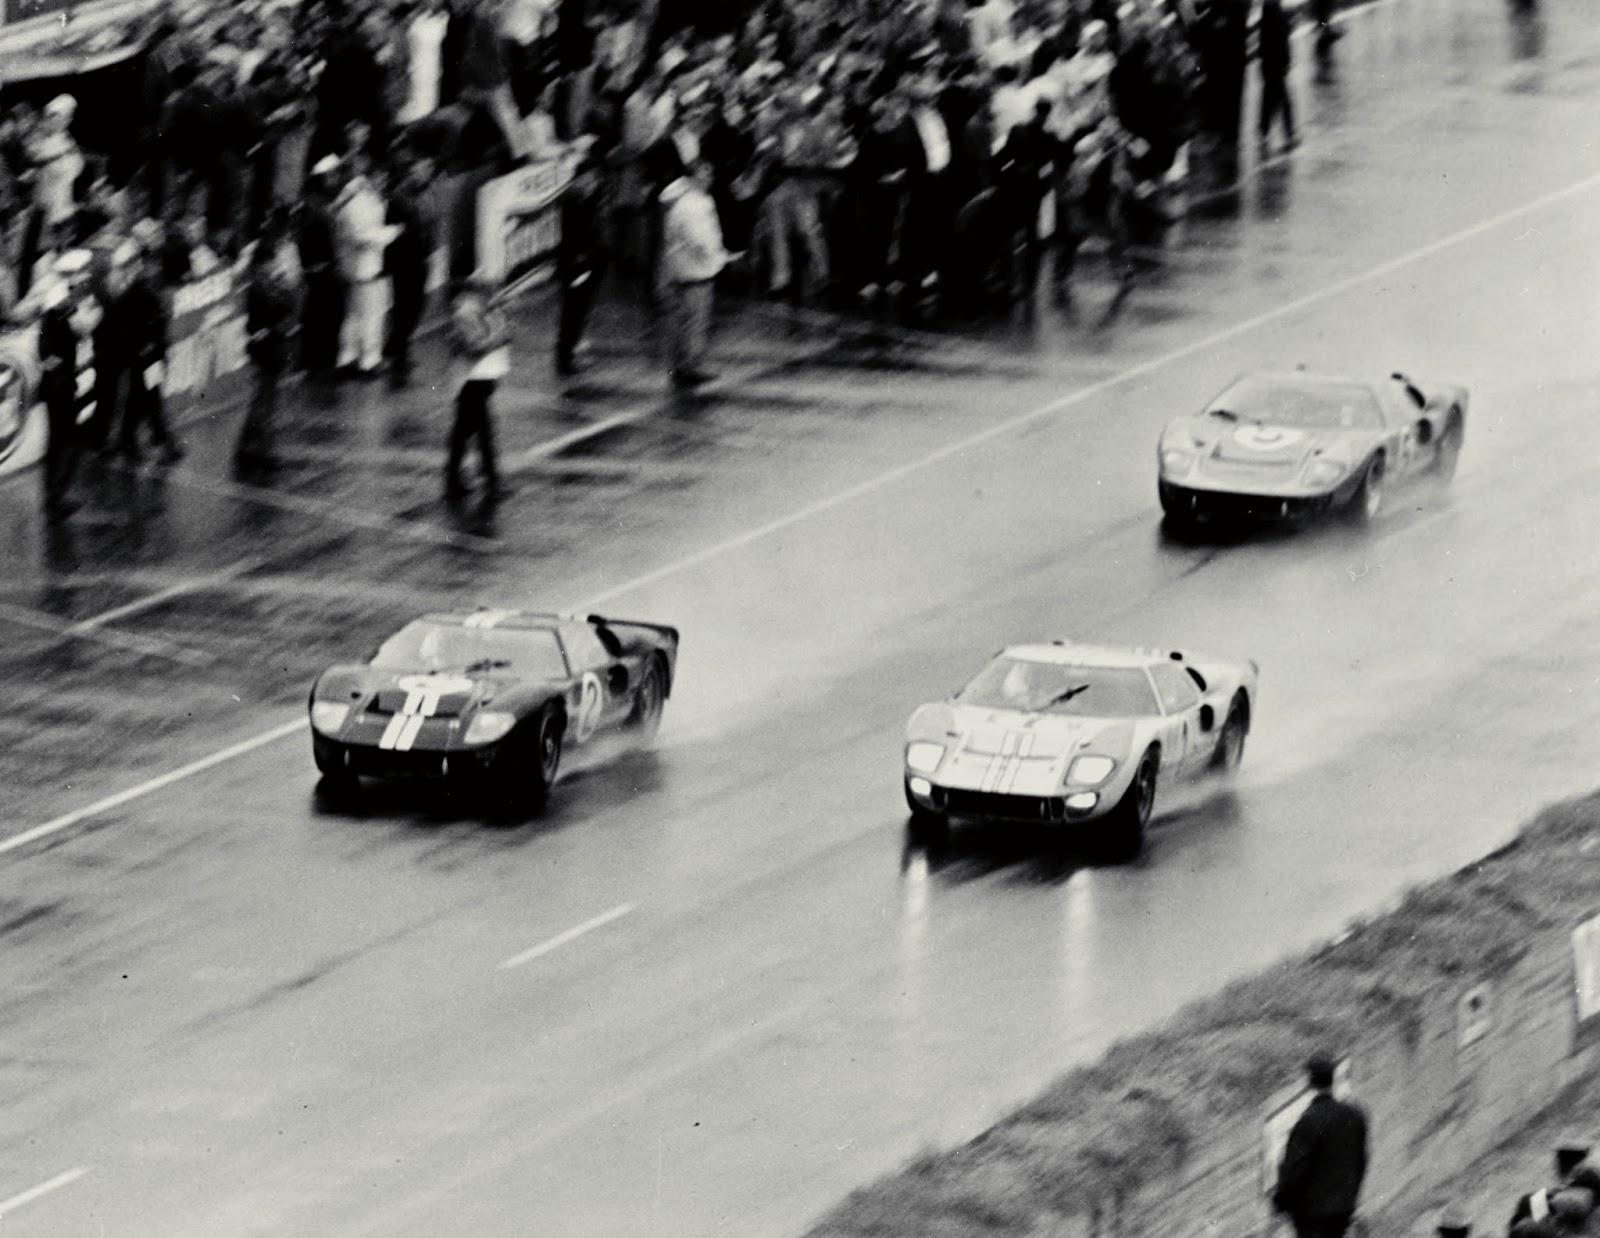 1966 GT40s LeMans HR Το FORD GT επιστρέφει στον θρυλικό αγώνα του Le Mans